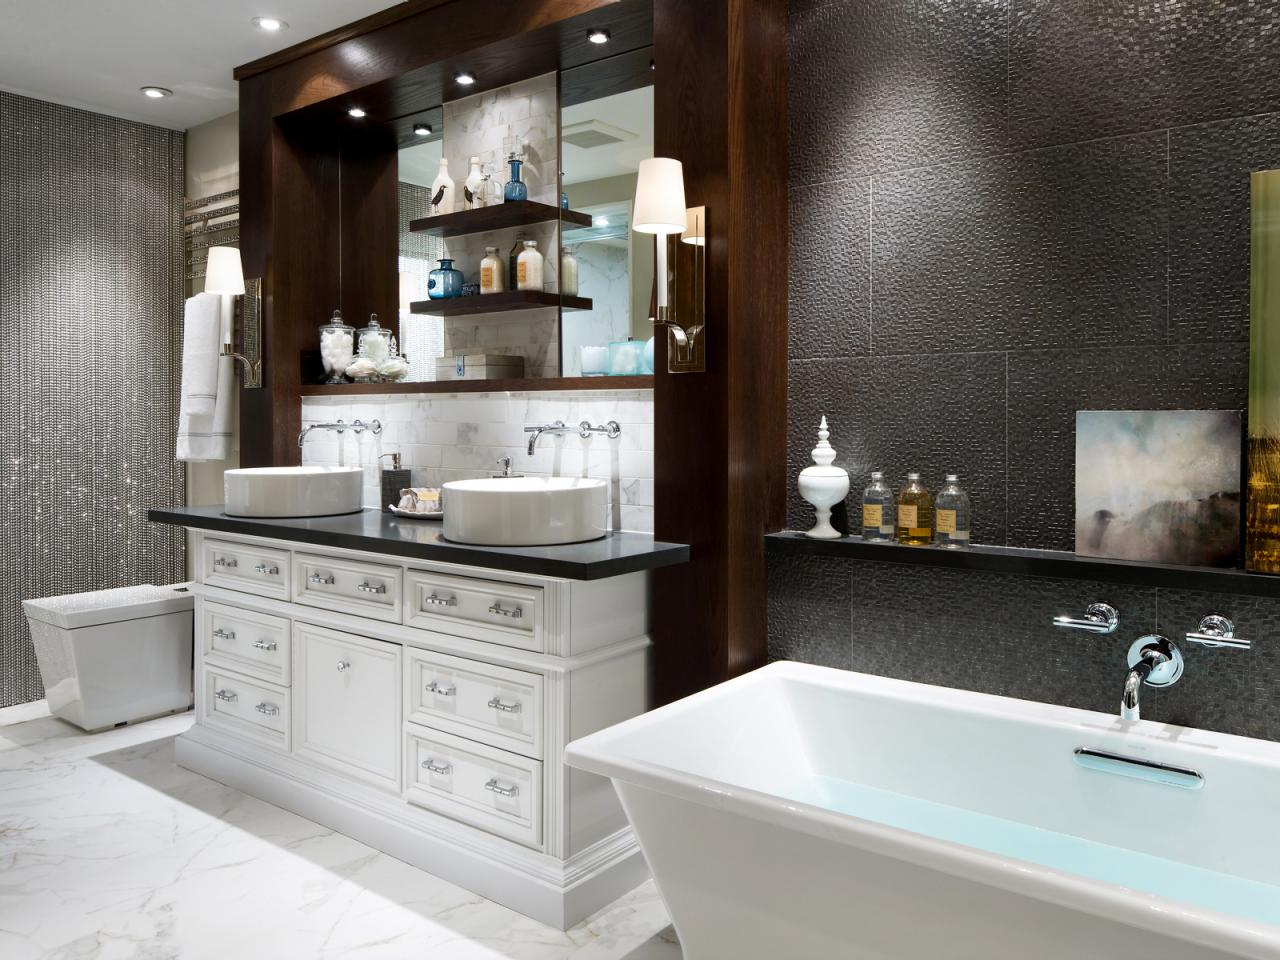 White Olson Bathrooms Style (Image 10 of 10)